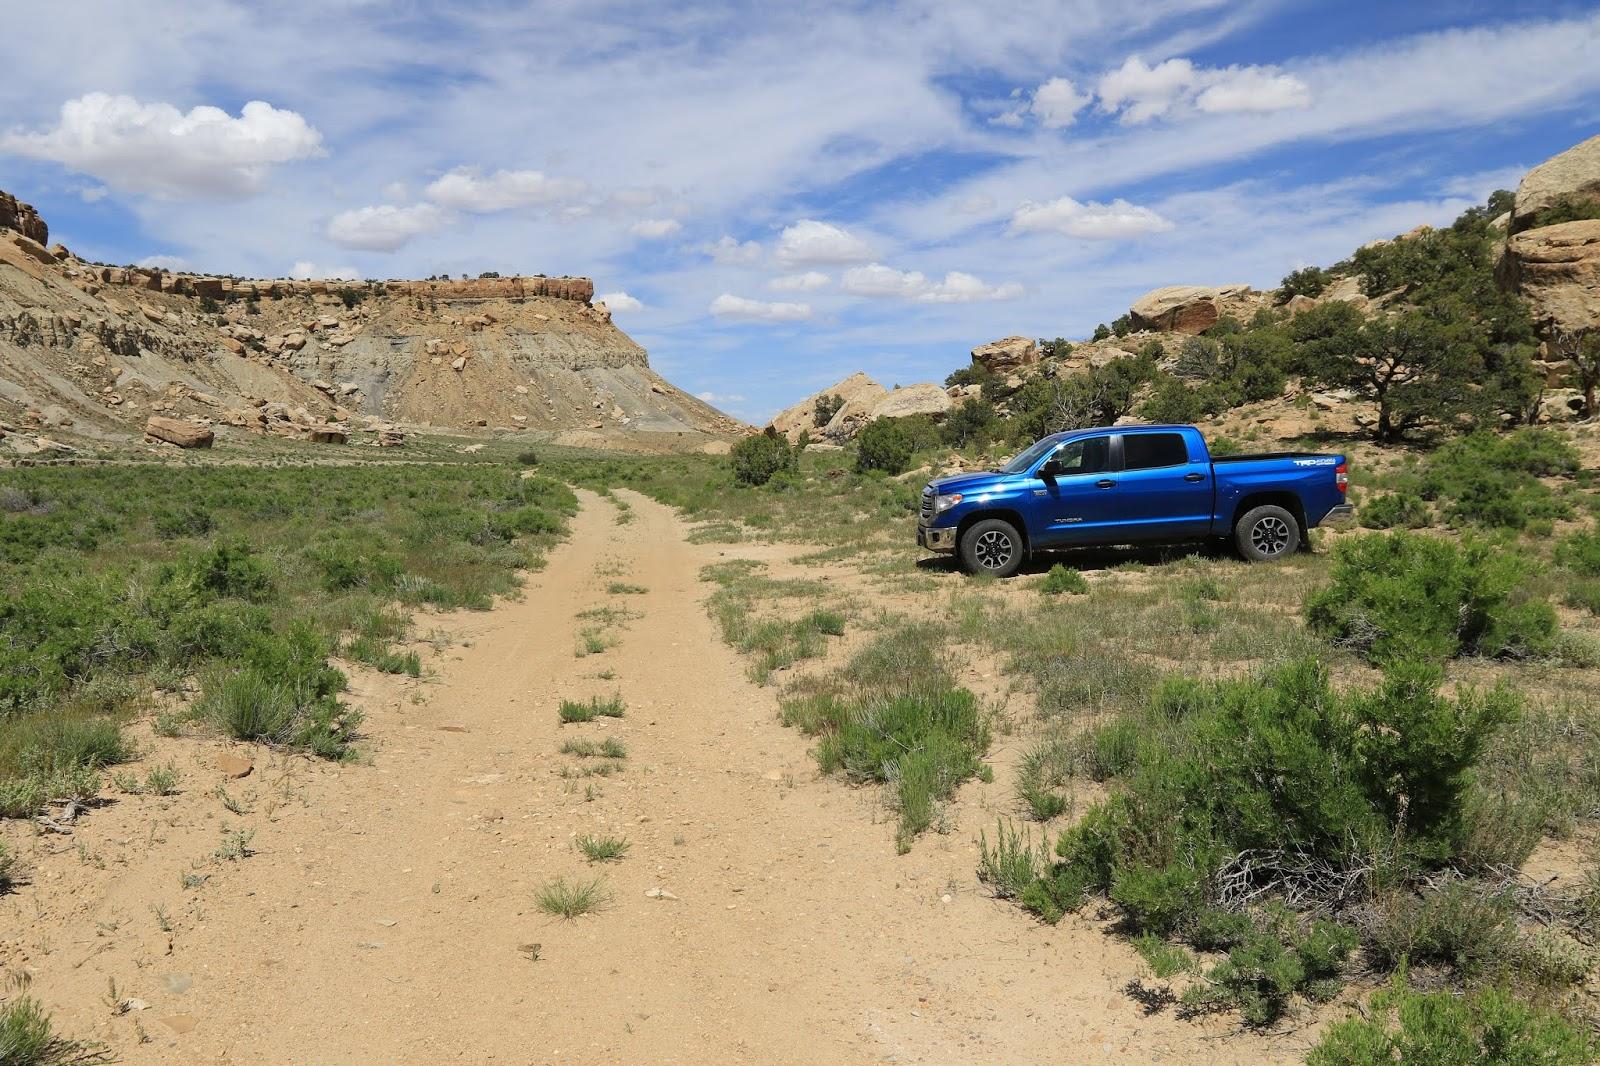 gjhikes.com: Short Canyon